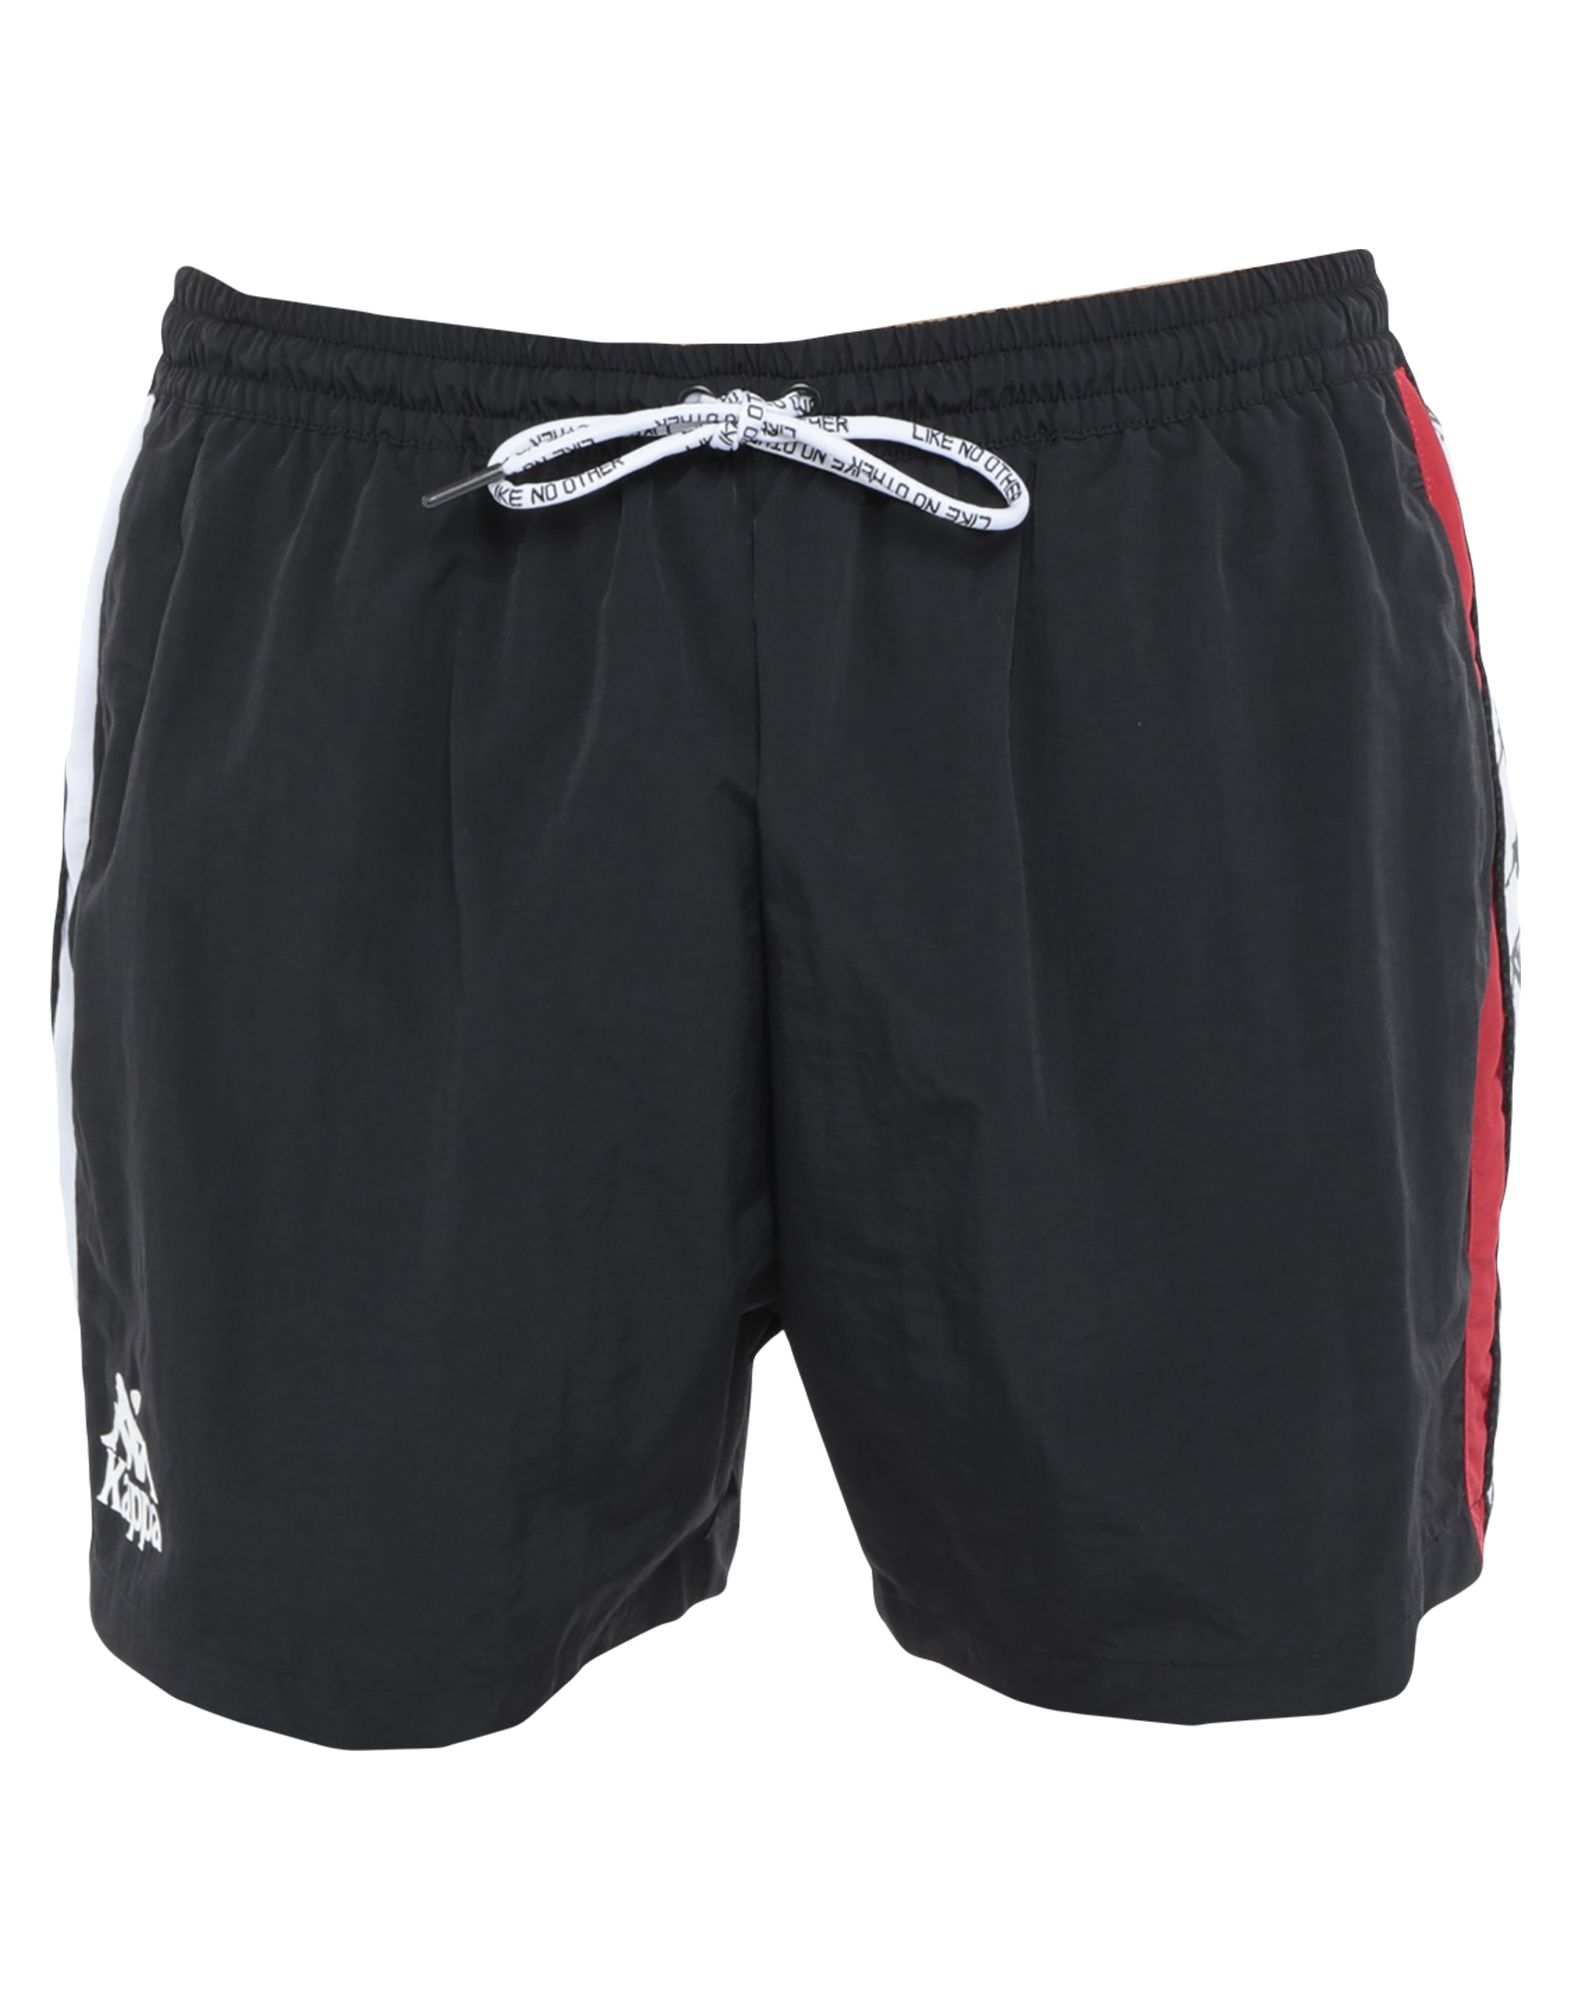 KAPPA Swim trunks - Item 47252516